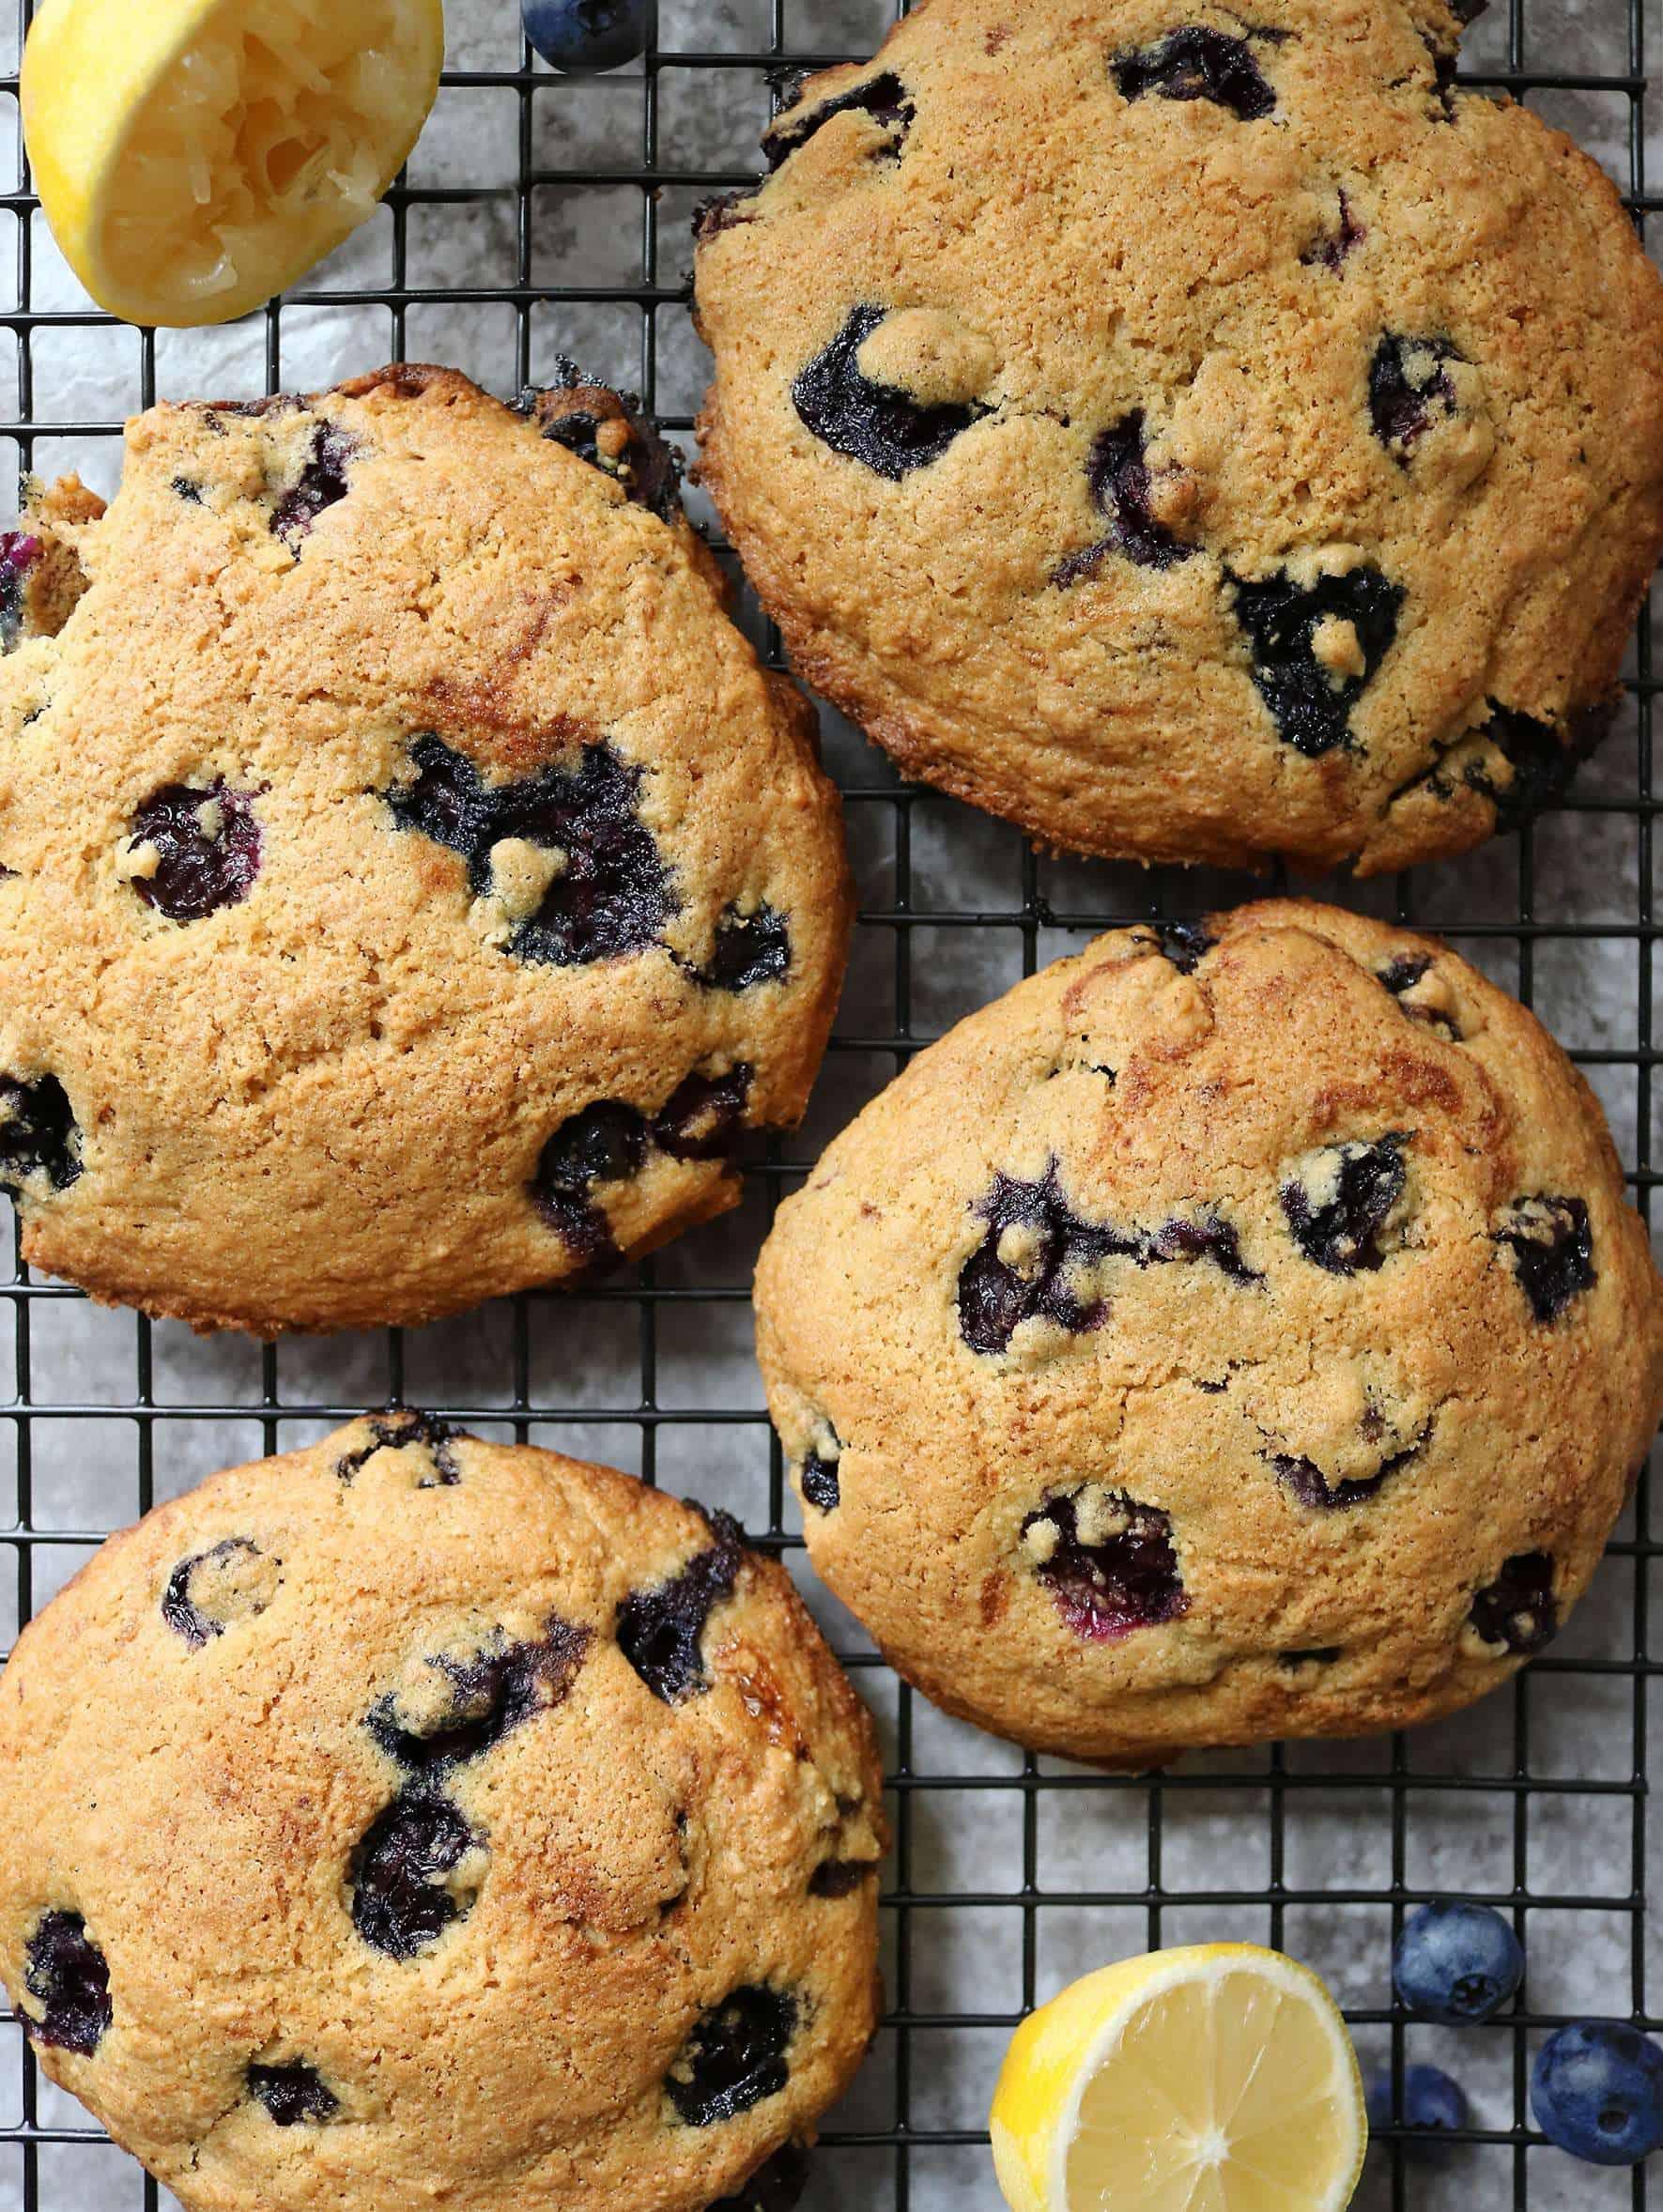 Gluten Free Lemon Blueberry Muffin Tops Image